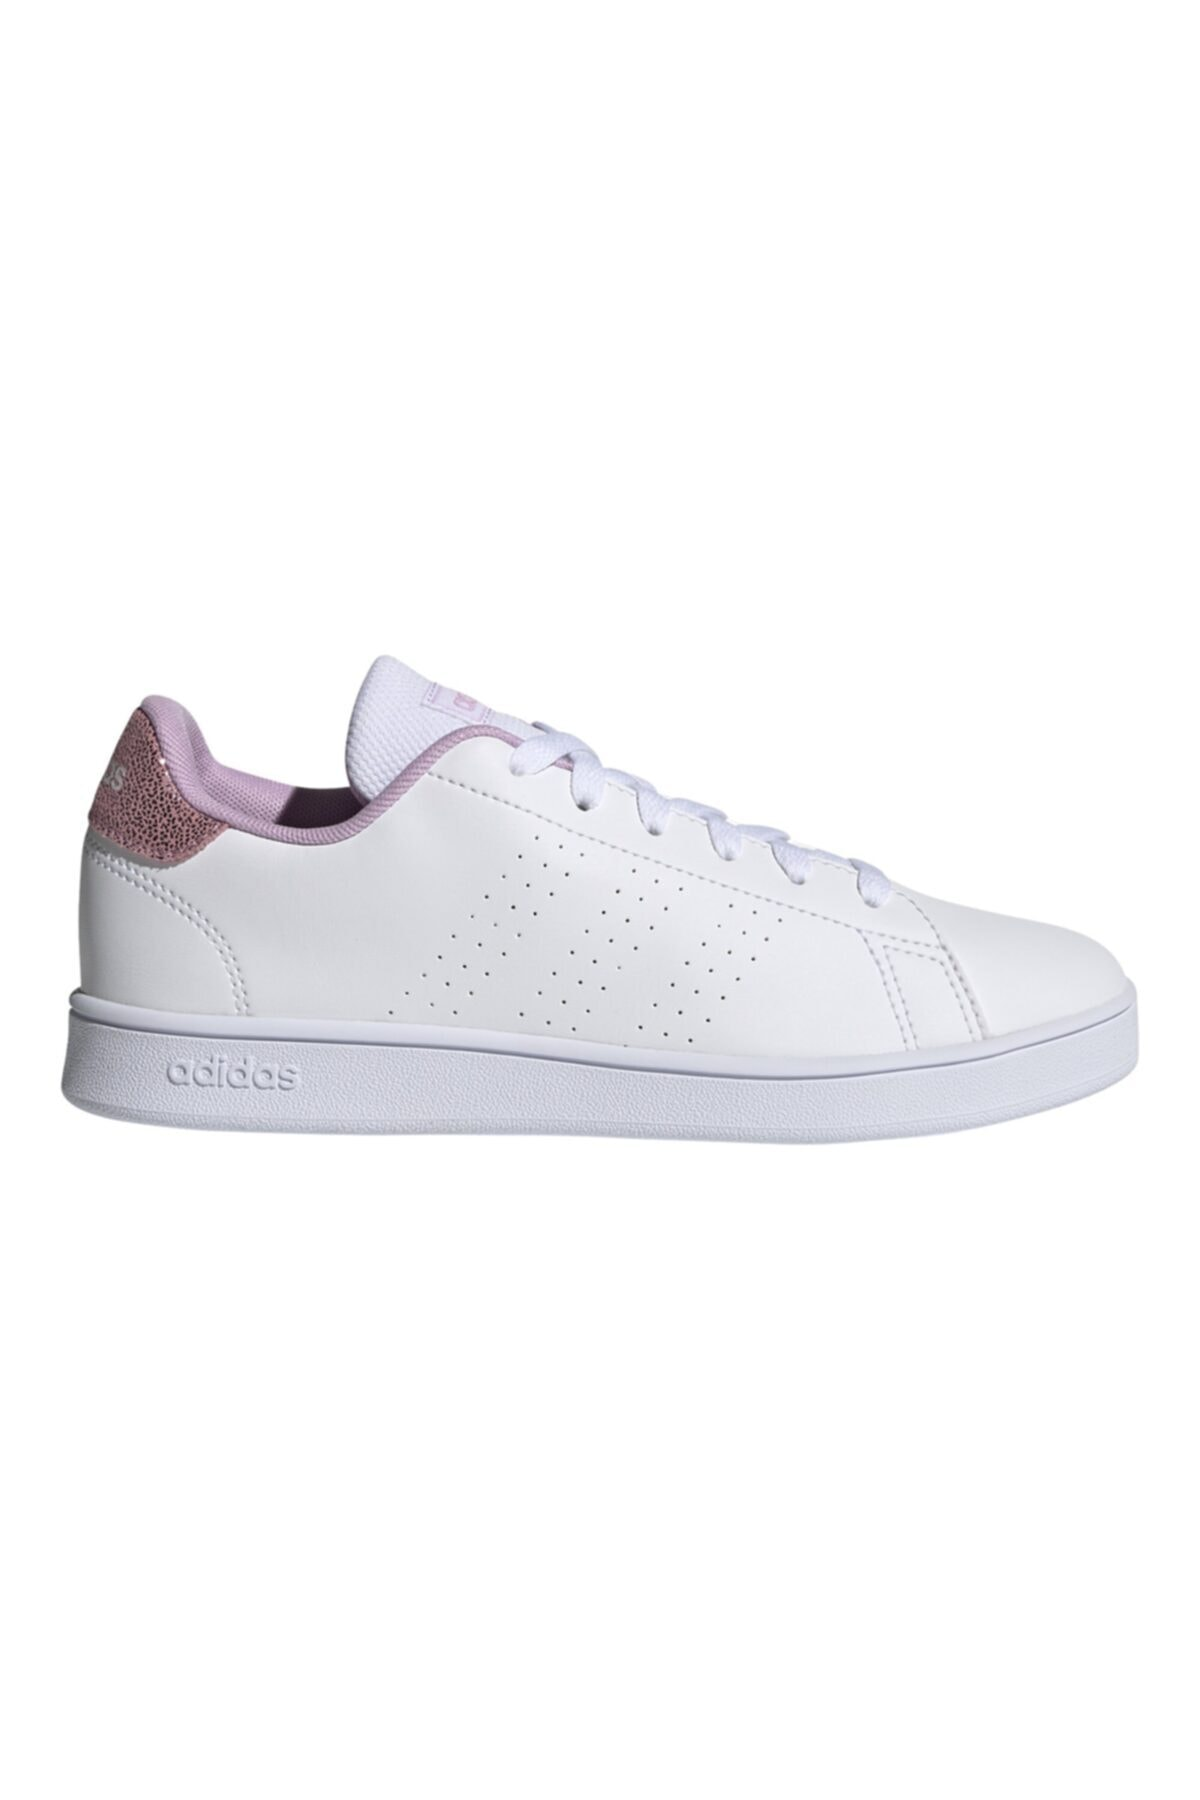 adidas Advantage (gs) Spor Ayakkabı 1